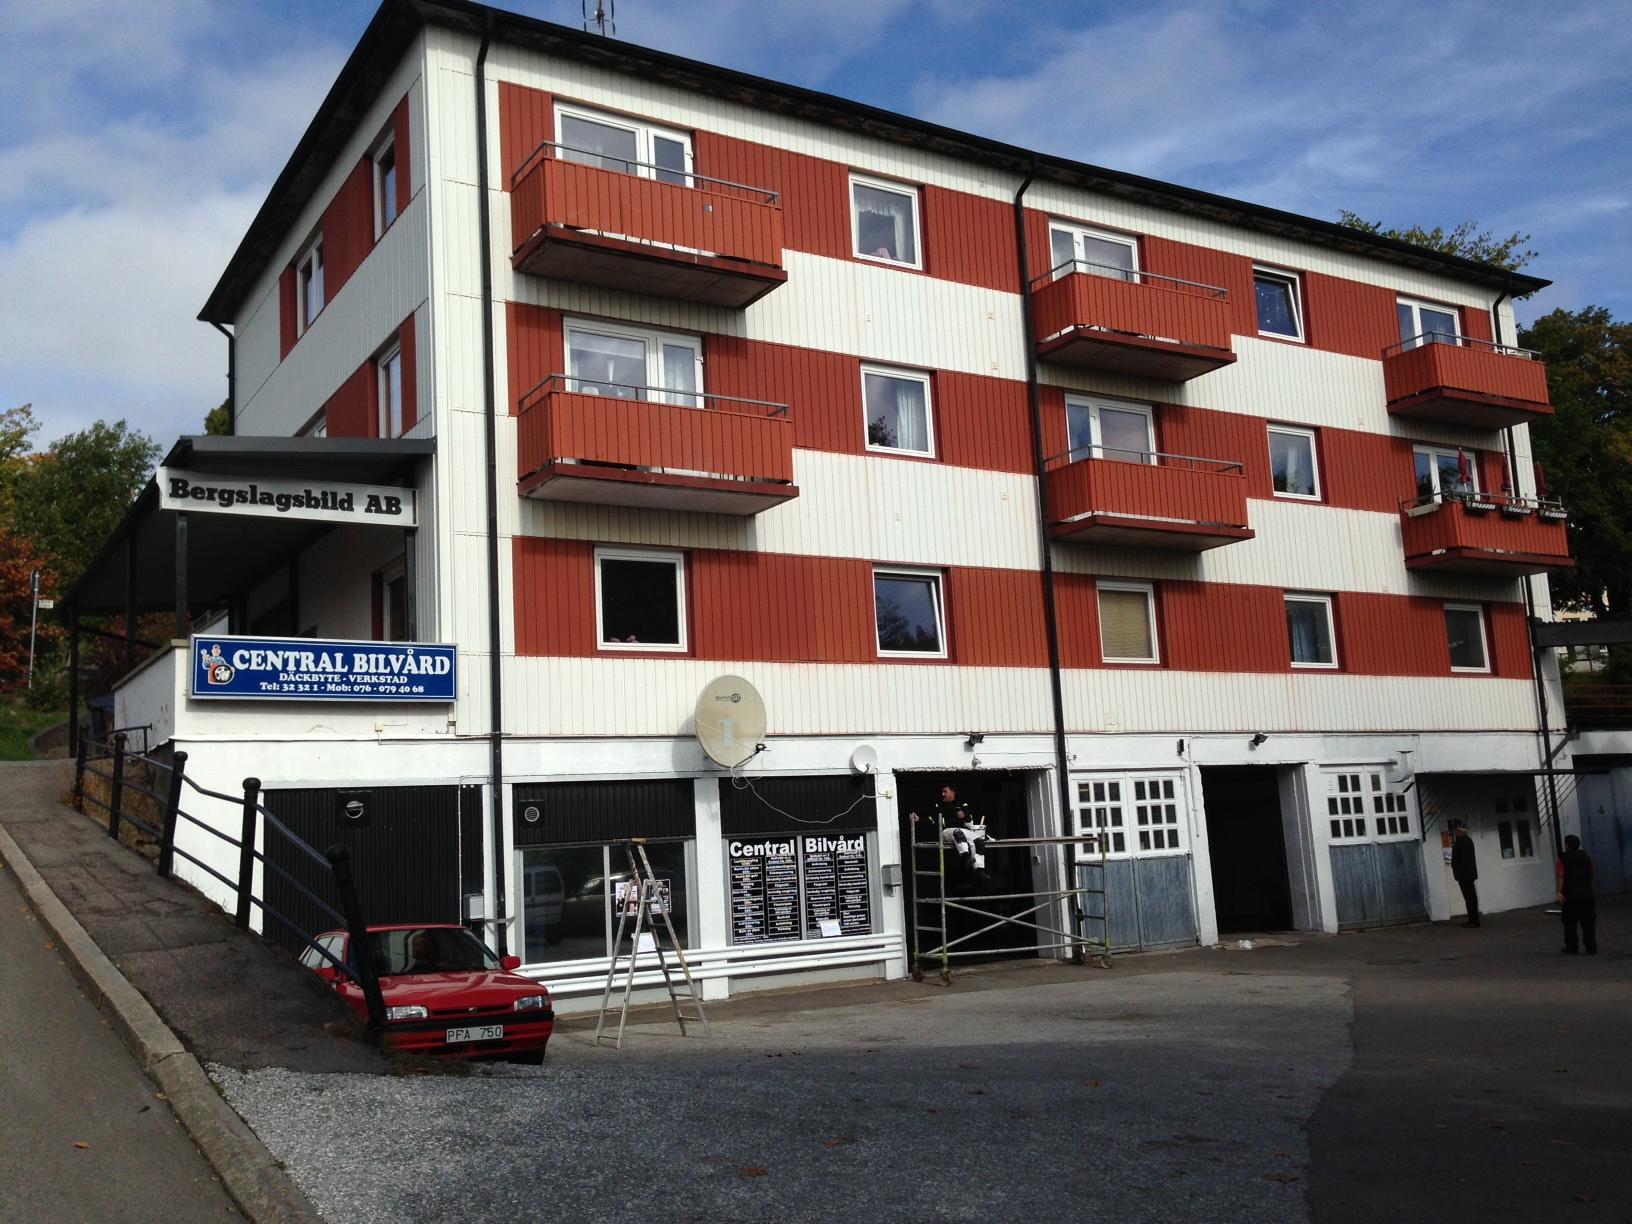 Badstugatan, Bankliden, Karlskoga